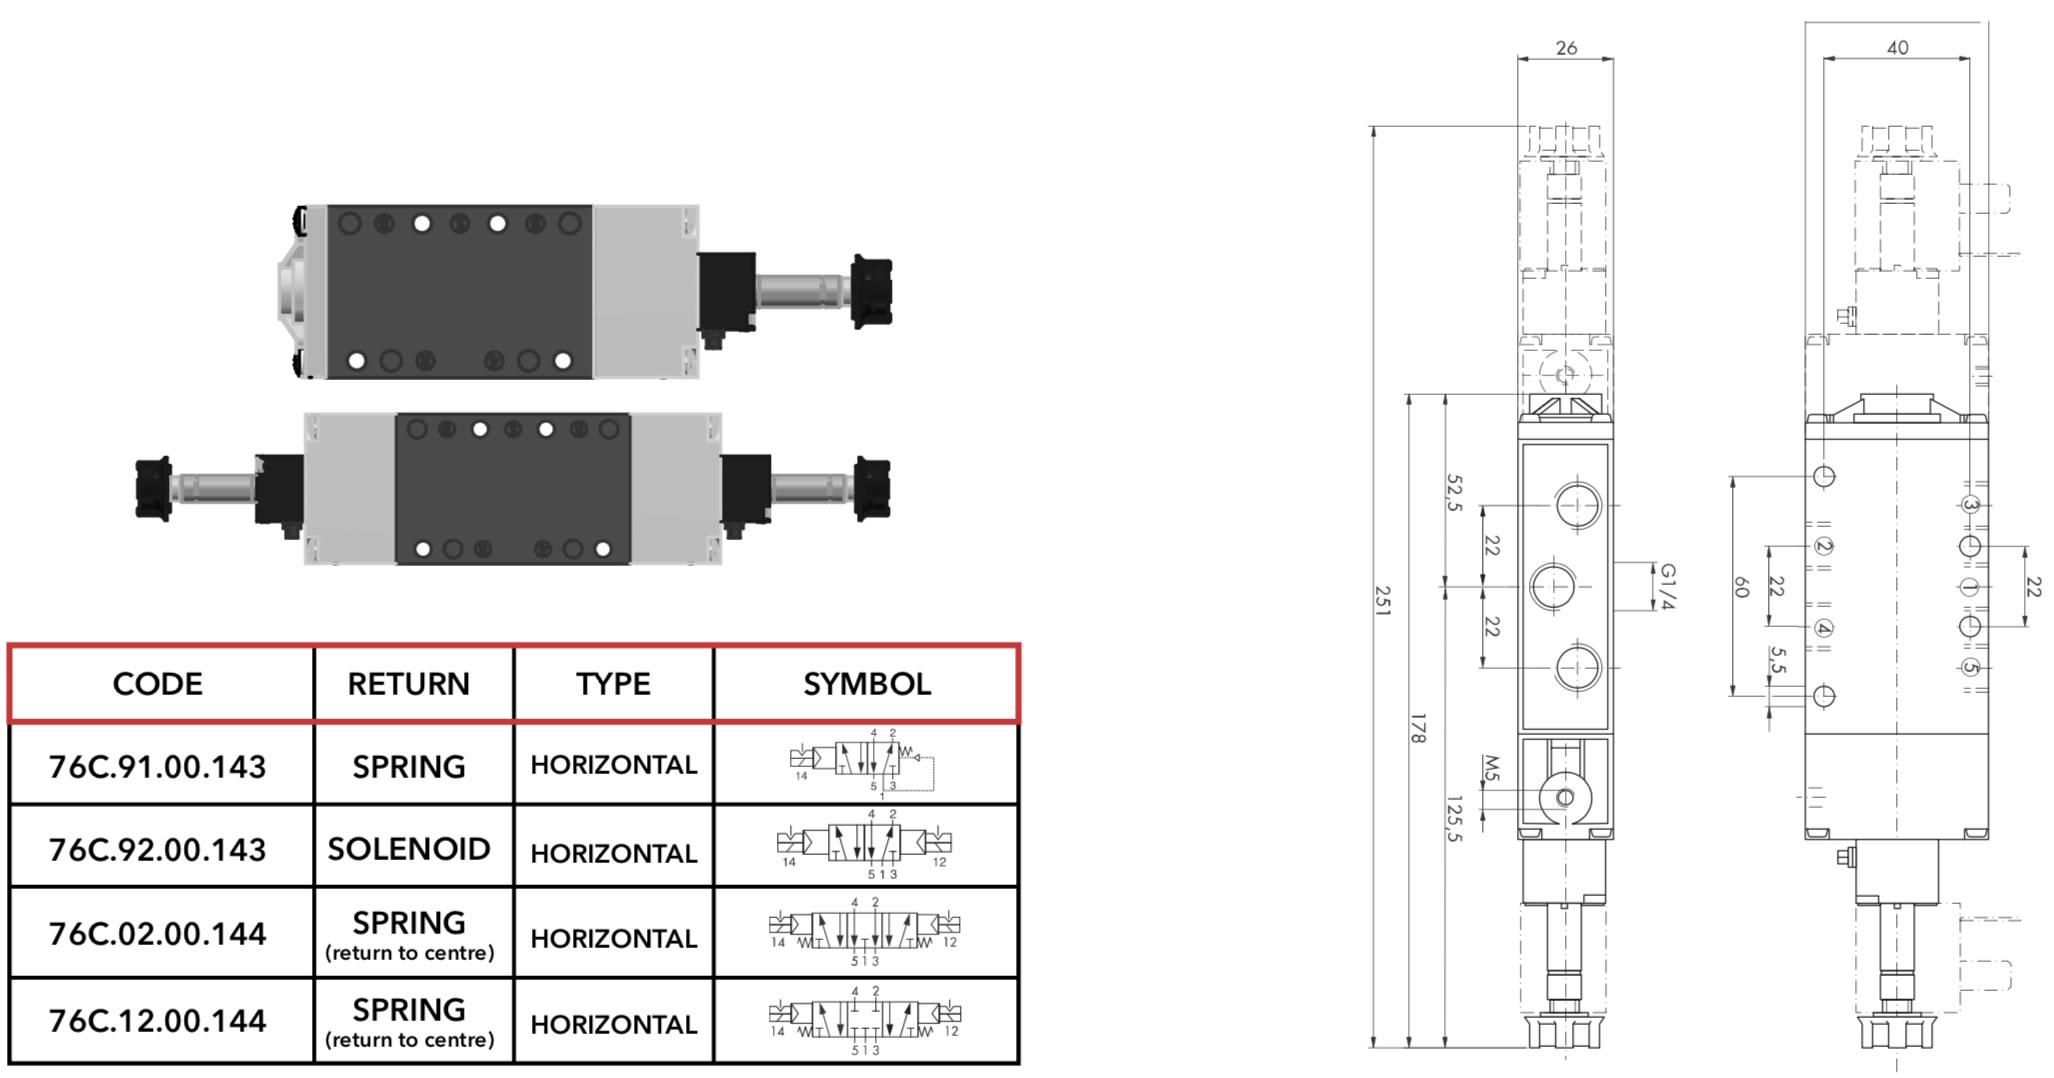 Solenoid Valve Diagram 3 2 Diagram 2 Solenoid Valve